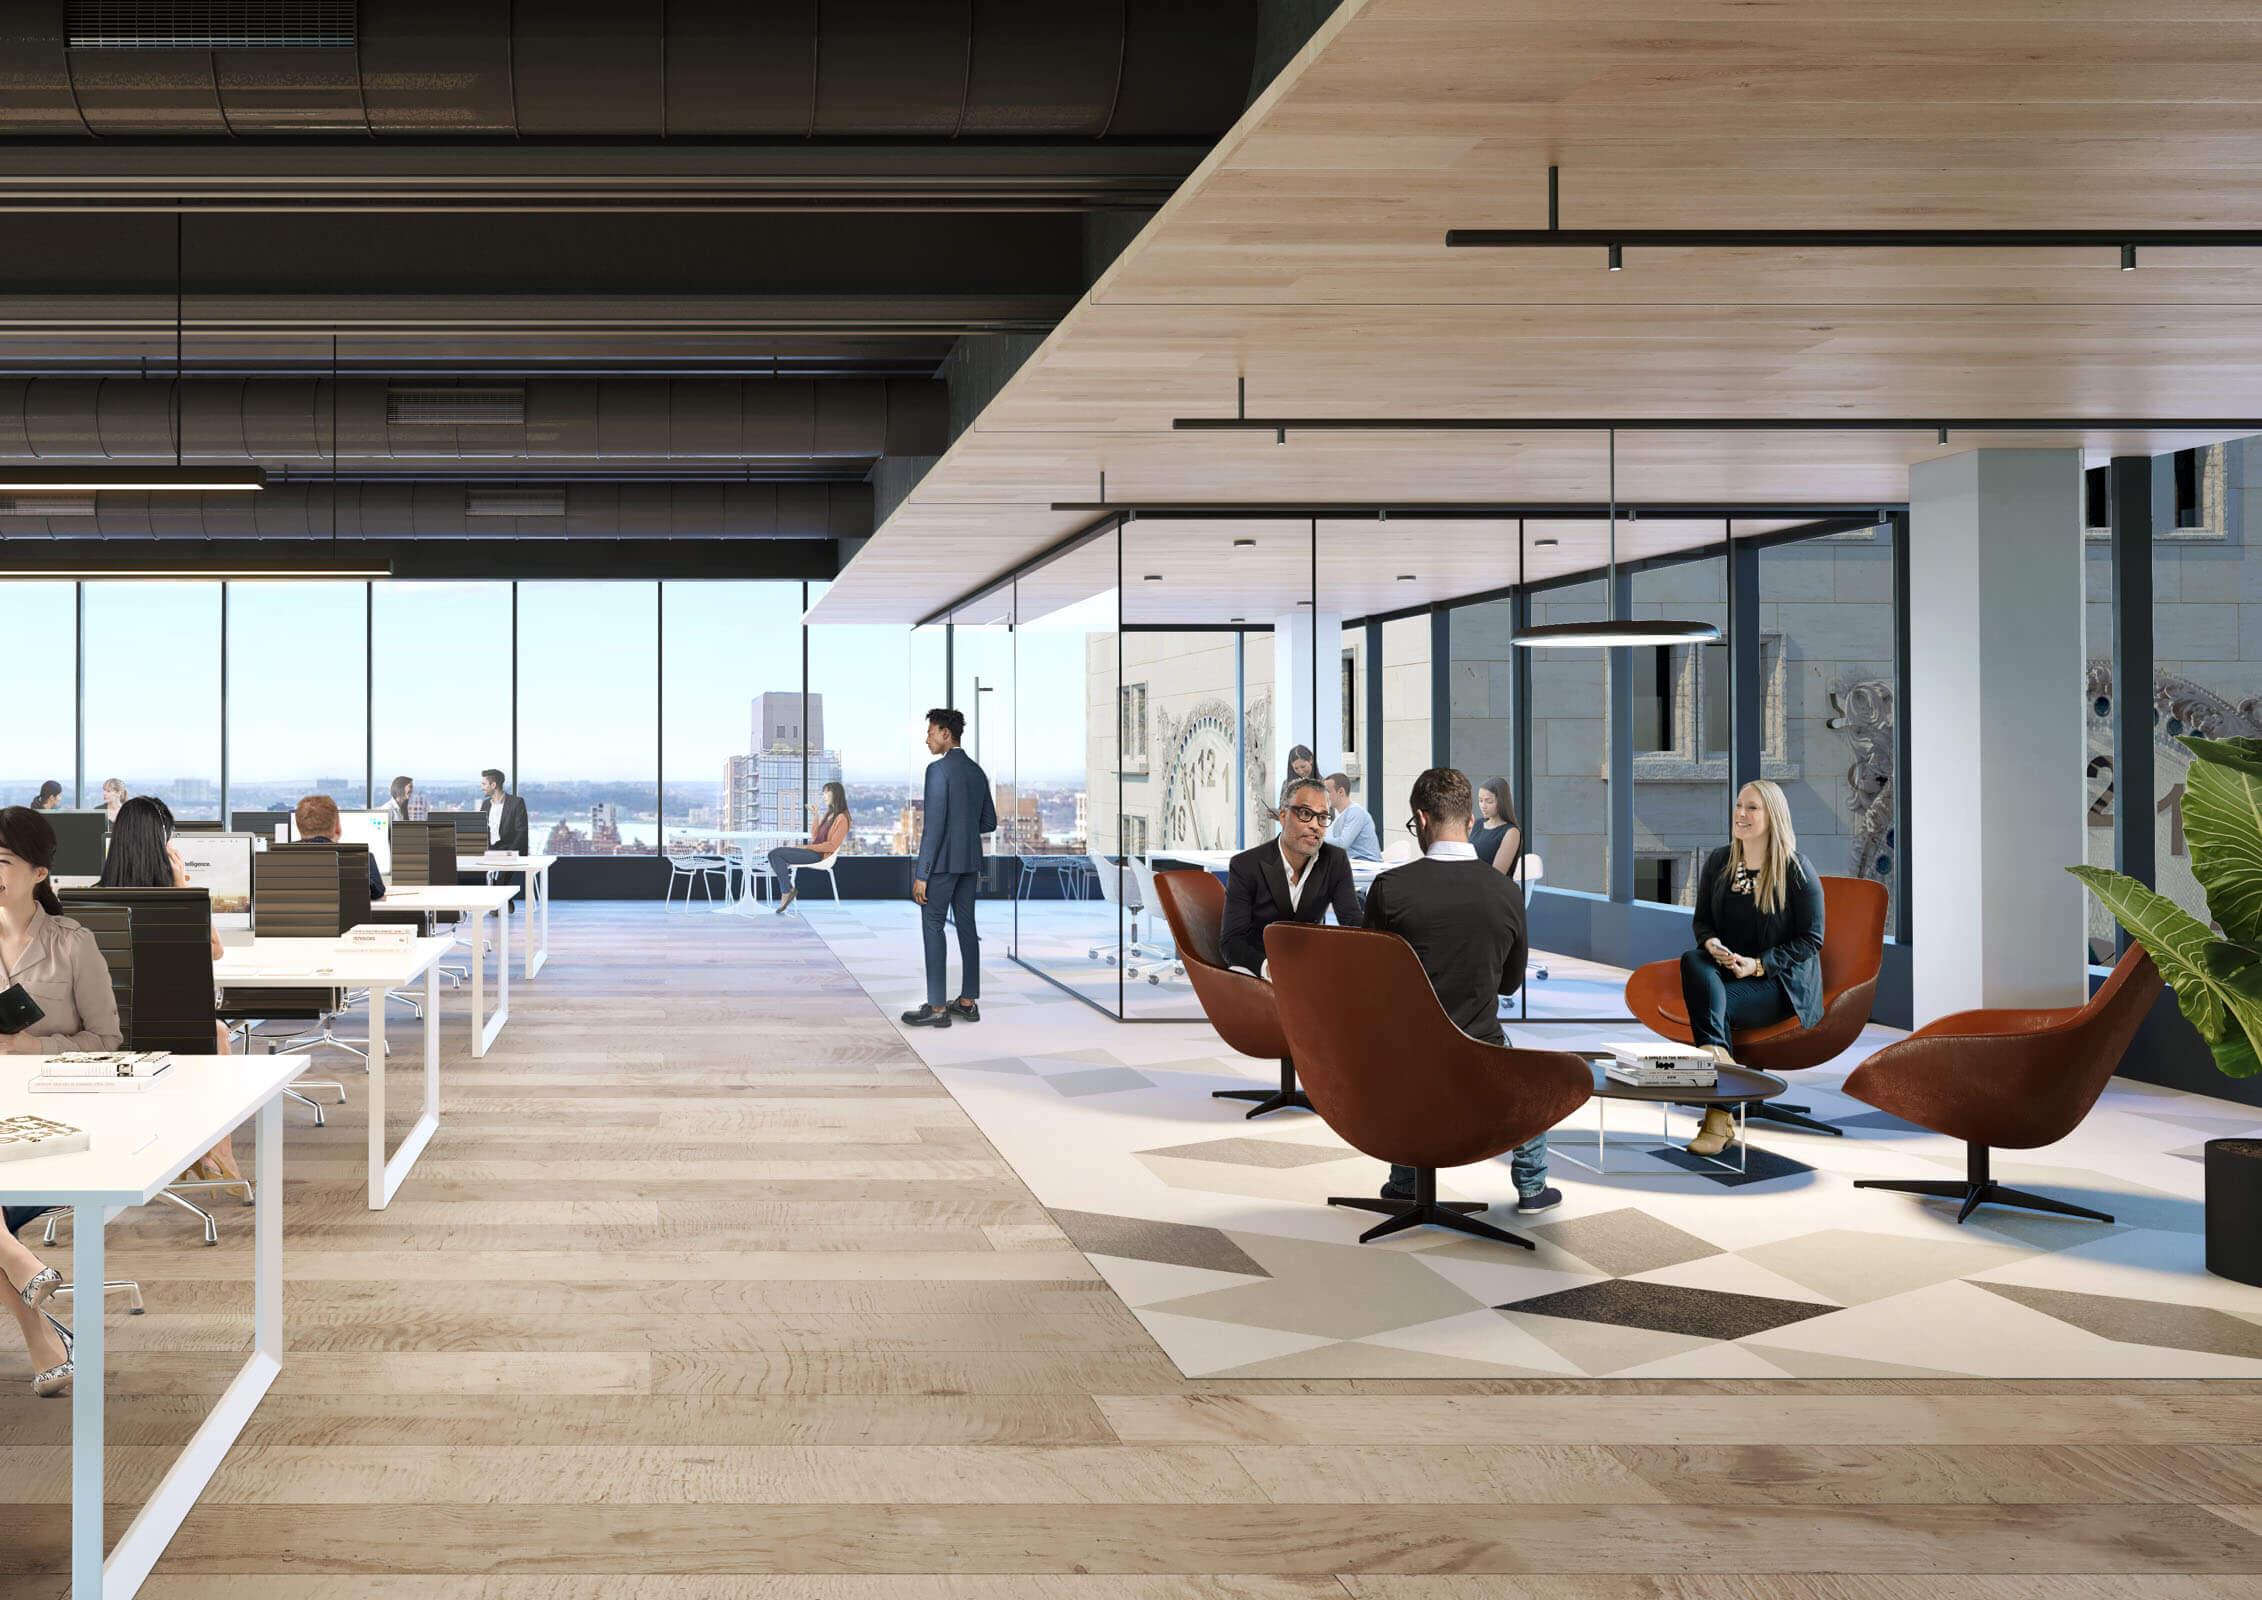 Tower Floor Interiors